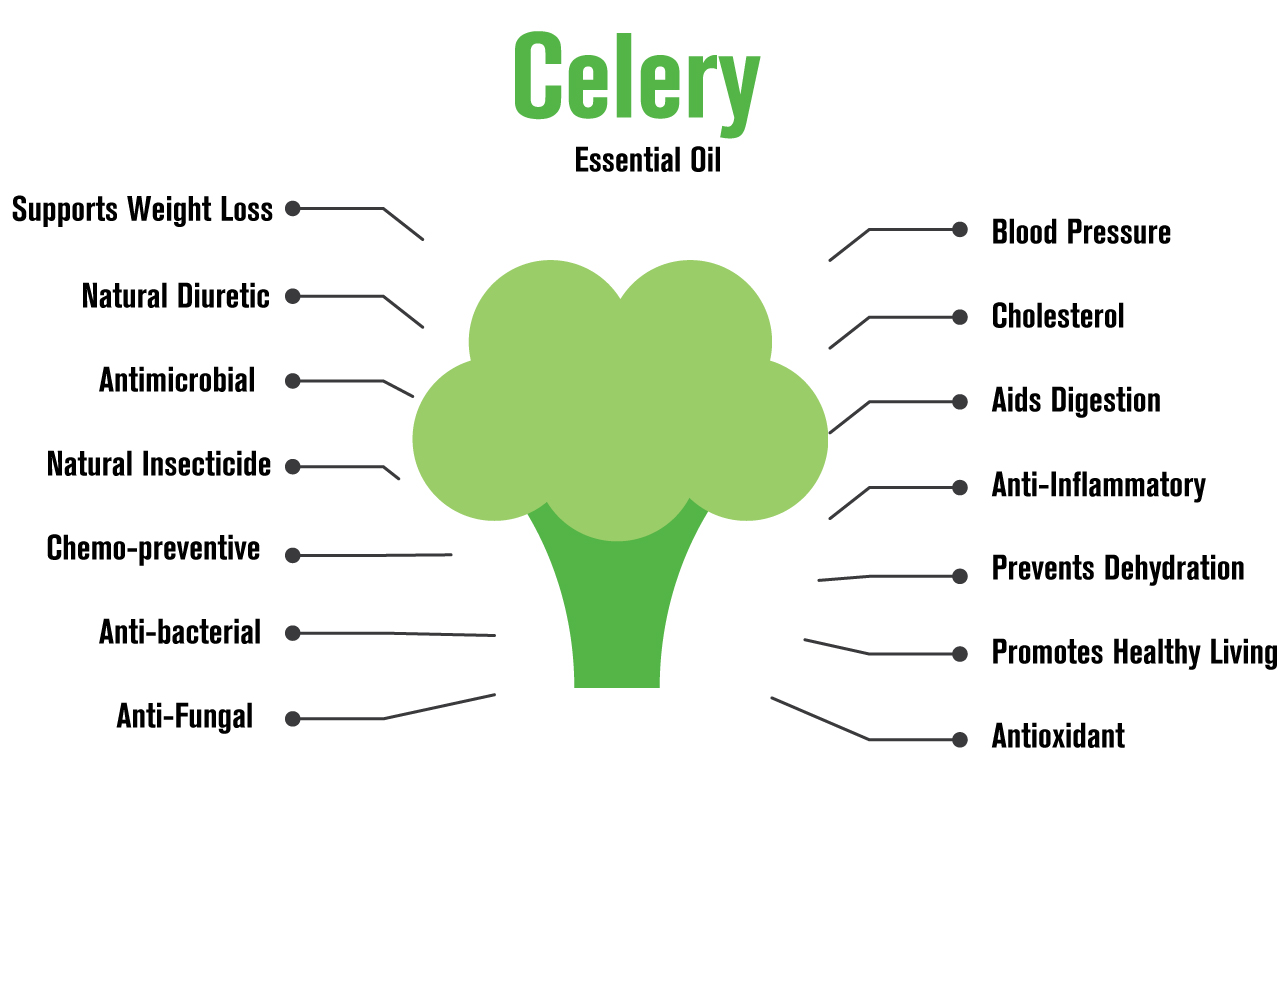 diagram of a celery - g2 wiring diagram  institut-triskell-de-diamant.fr